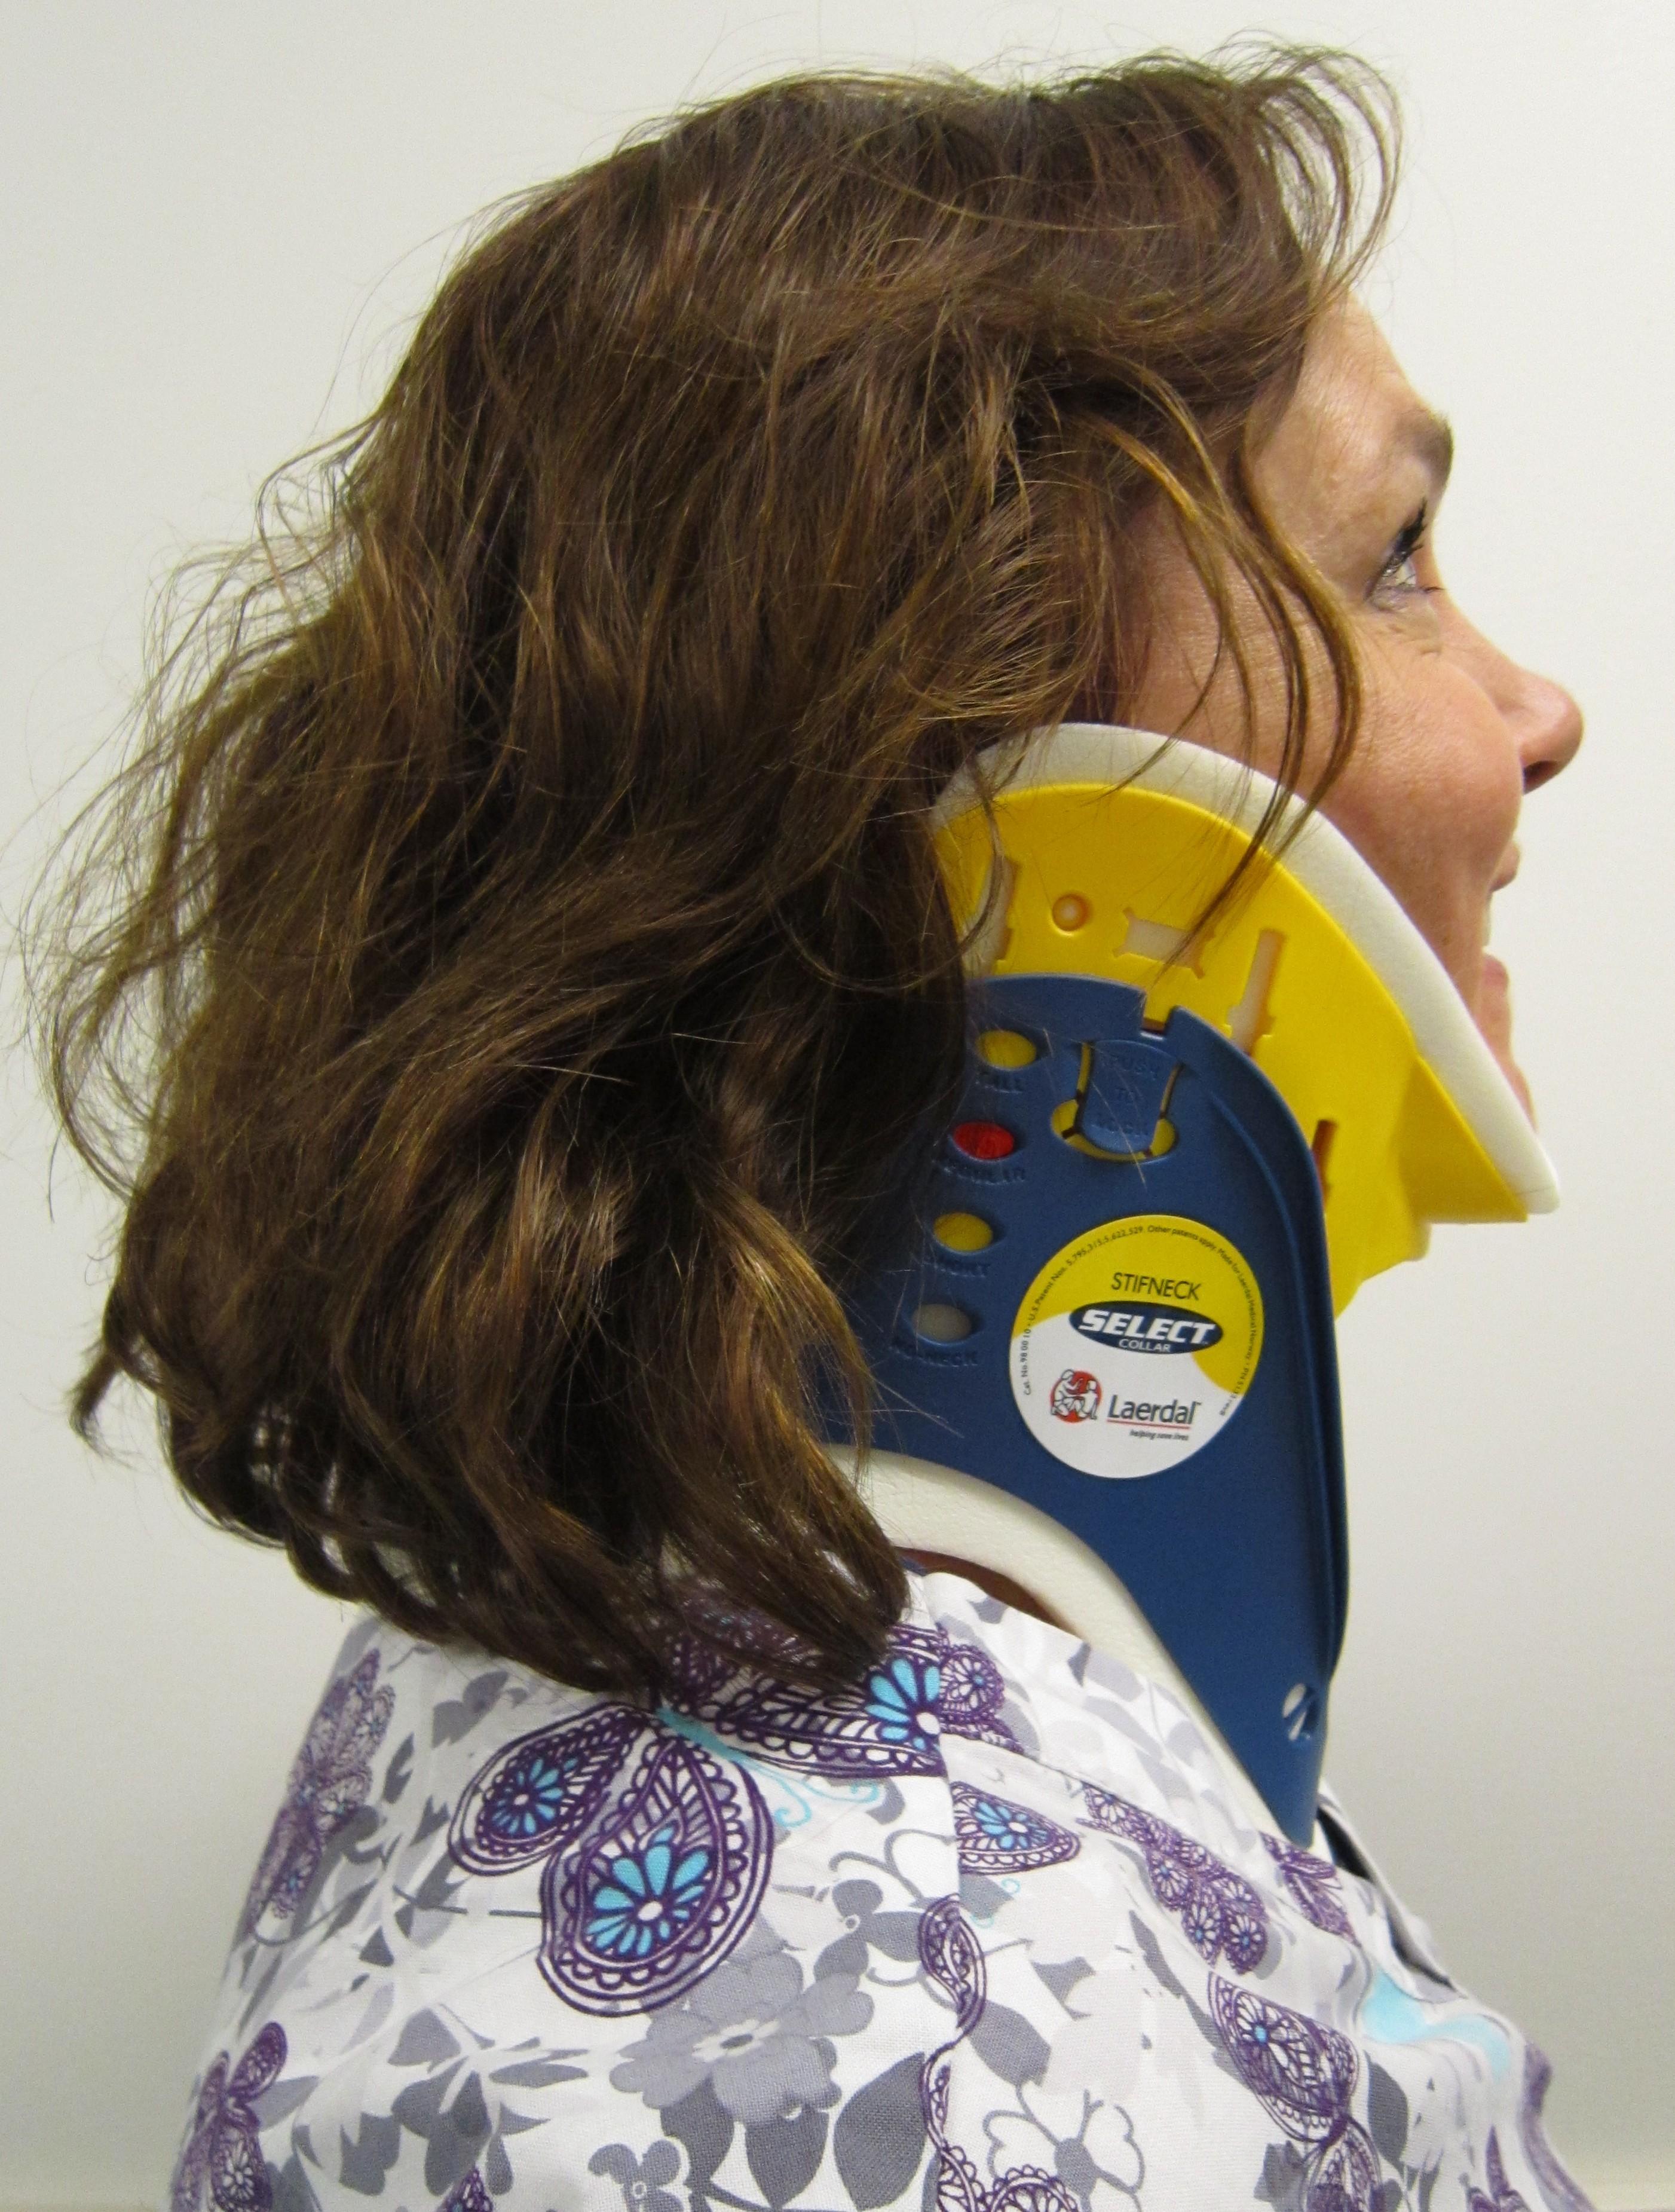 Cervical collar - Wikipedia